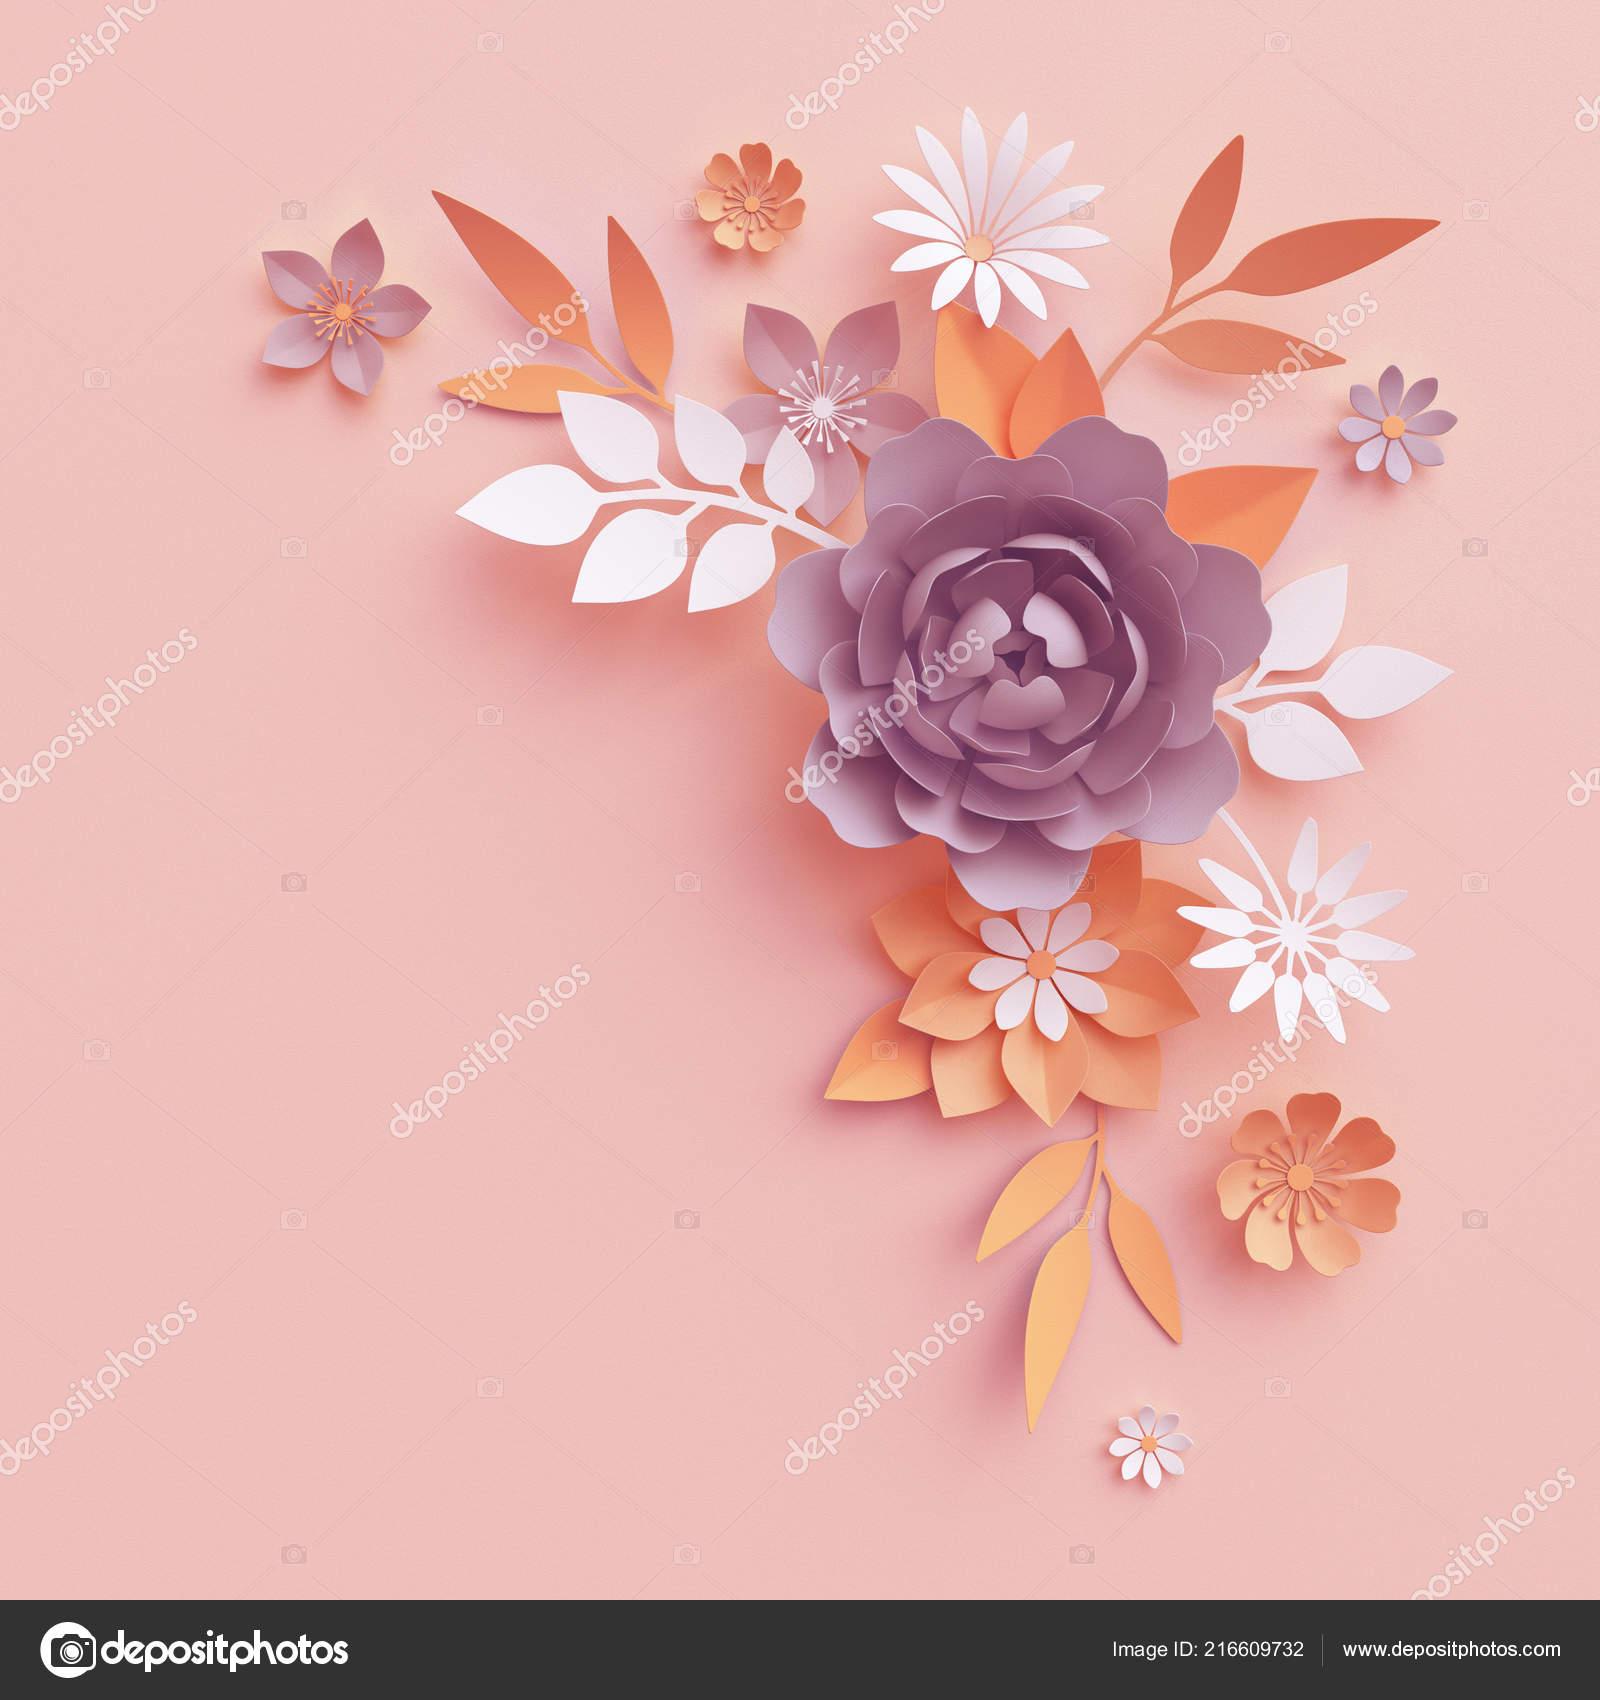 Render Flores Papel Caída Arreglo Botánico Arte Floral Clip